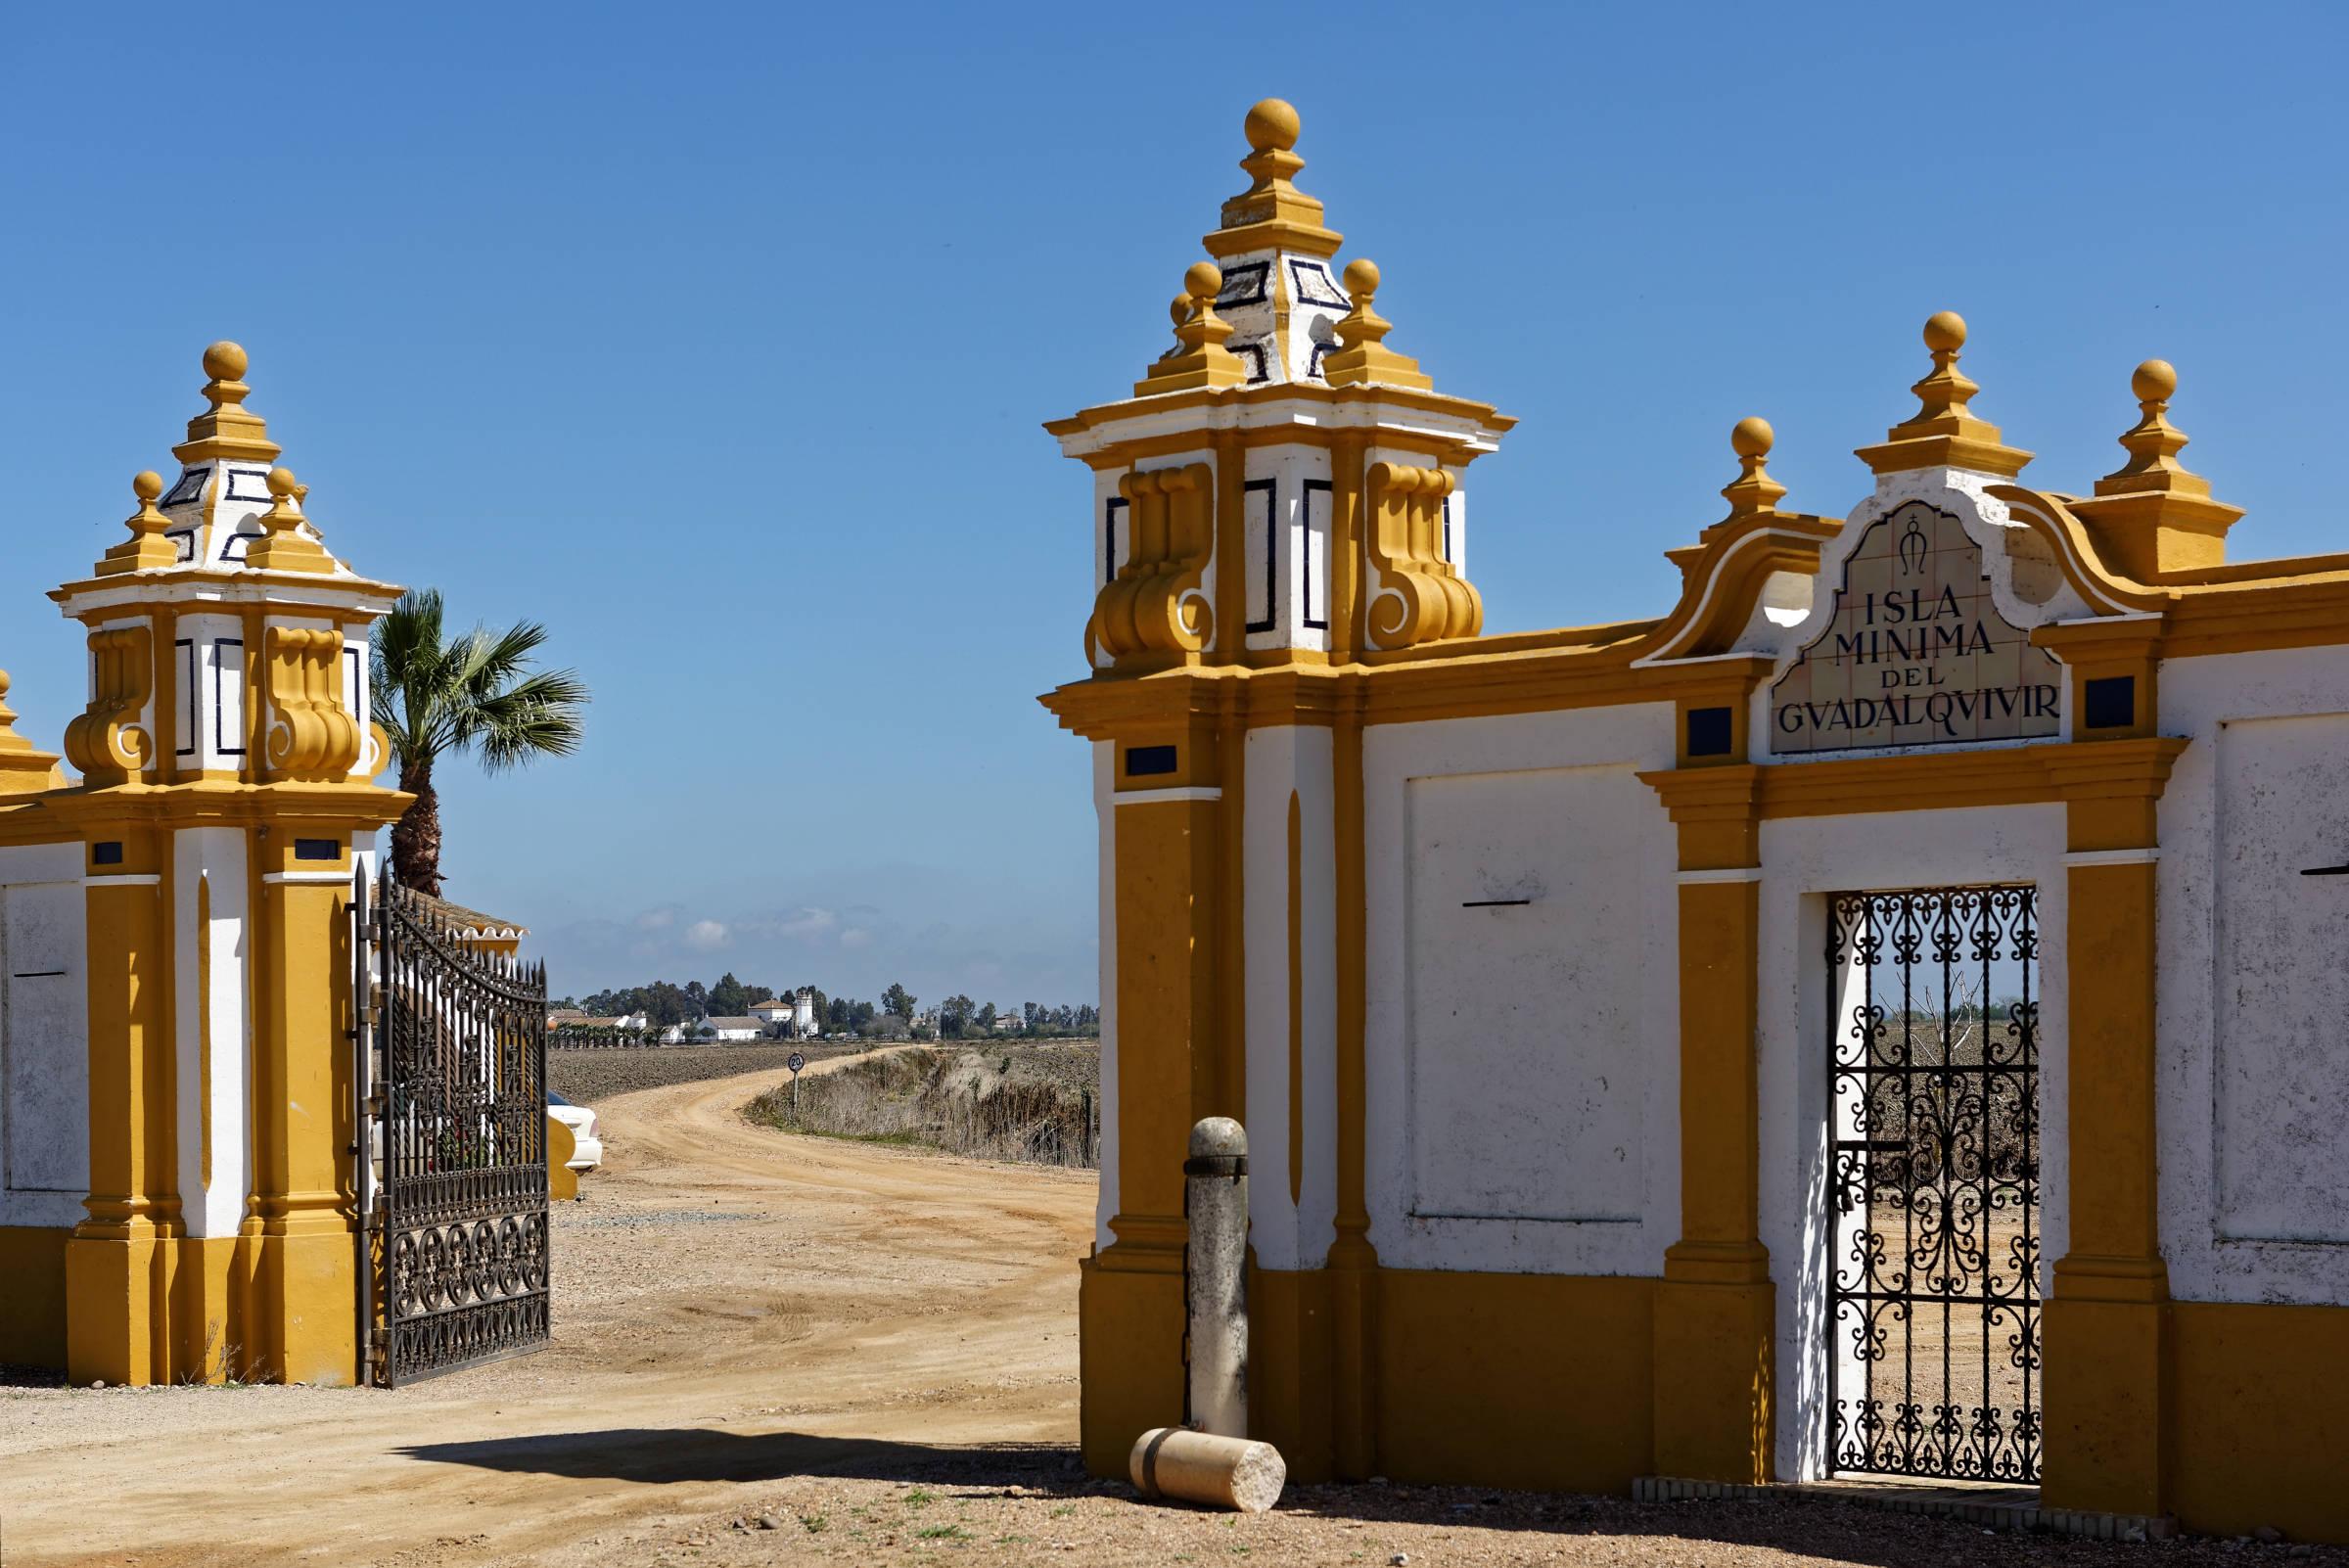 160414-Isla minima - Escobar (Andalousie) (16)